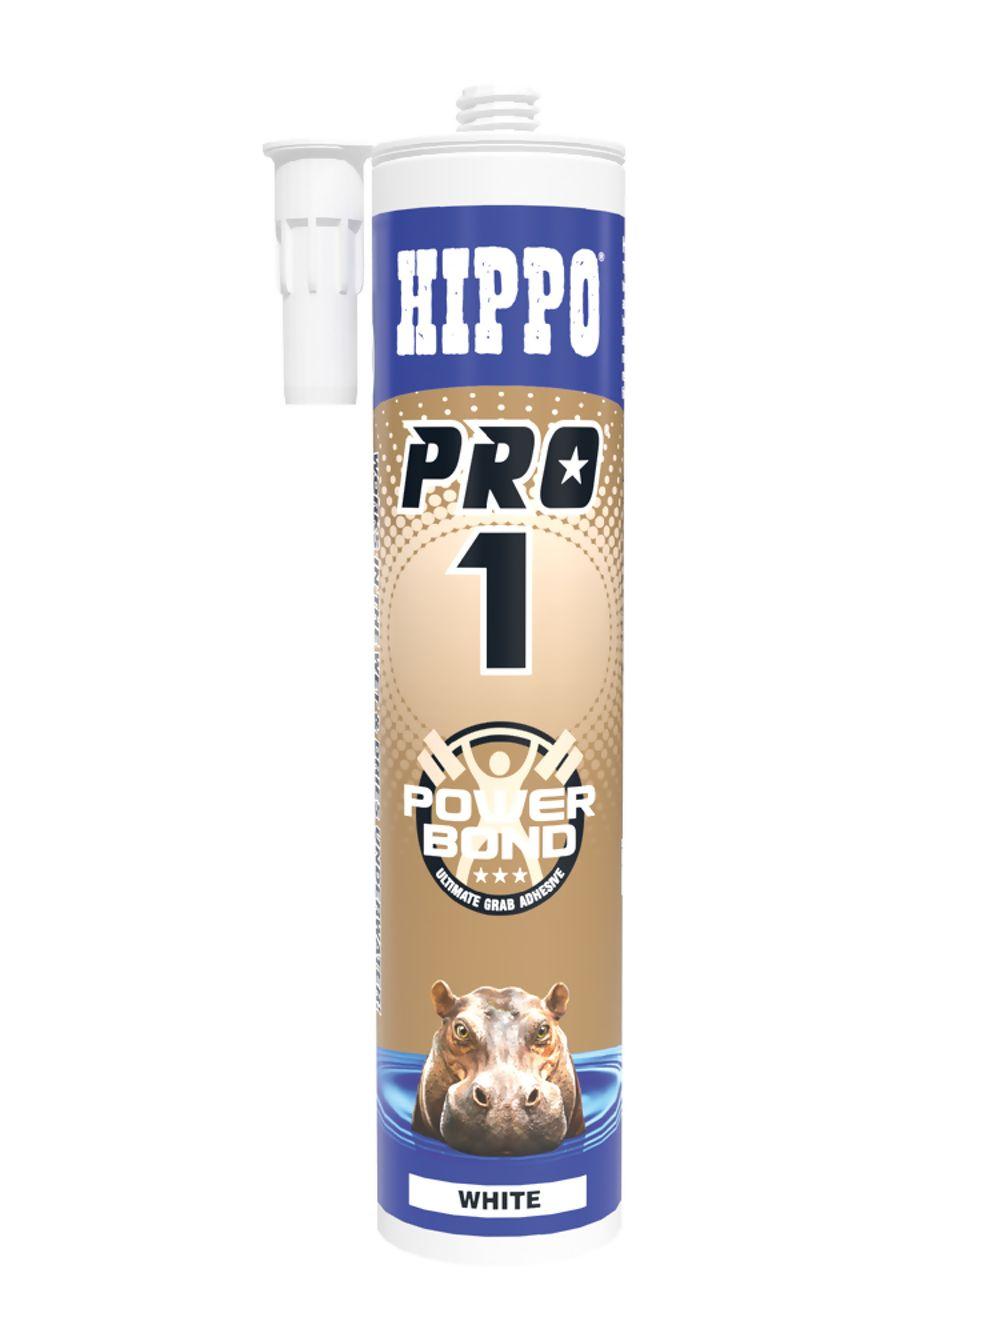 Hippo Pro 1 Power Bond Ultimate Grab Adhesive 310ml Ref H18508